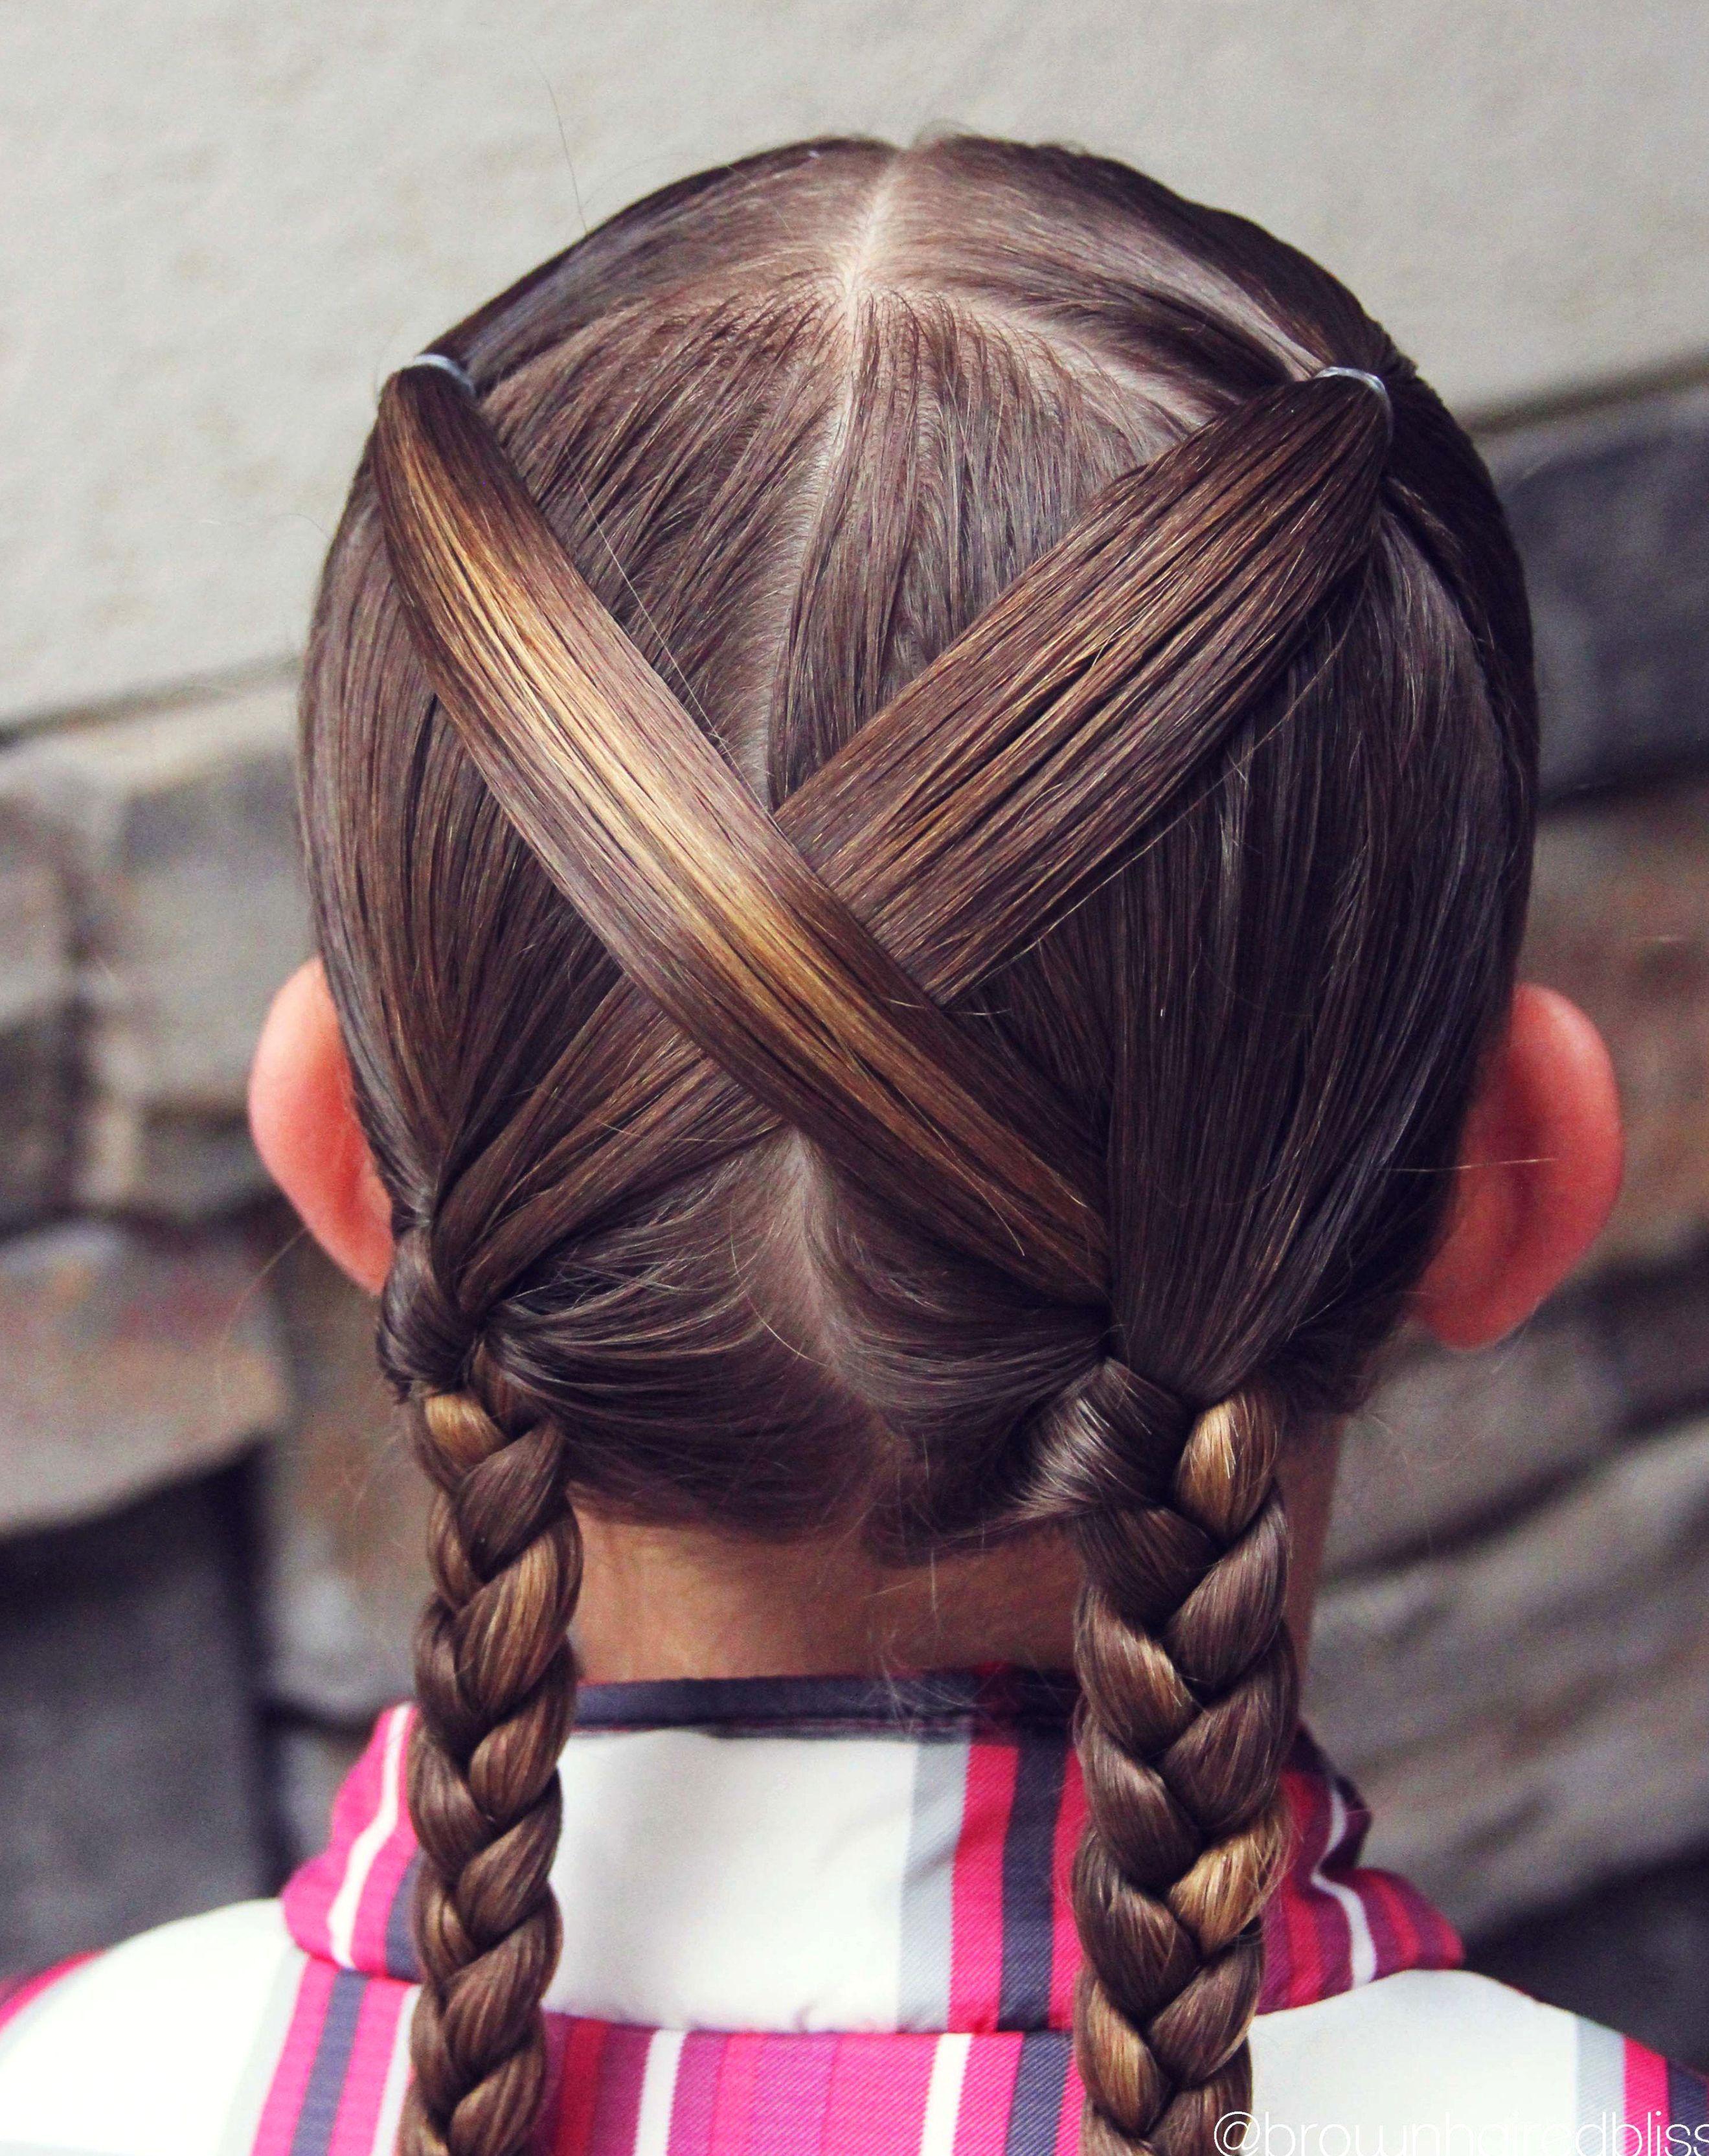 How To Take Care Of Winter Hair Peinados infantiles